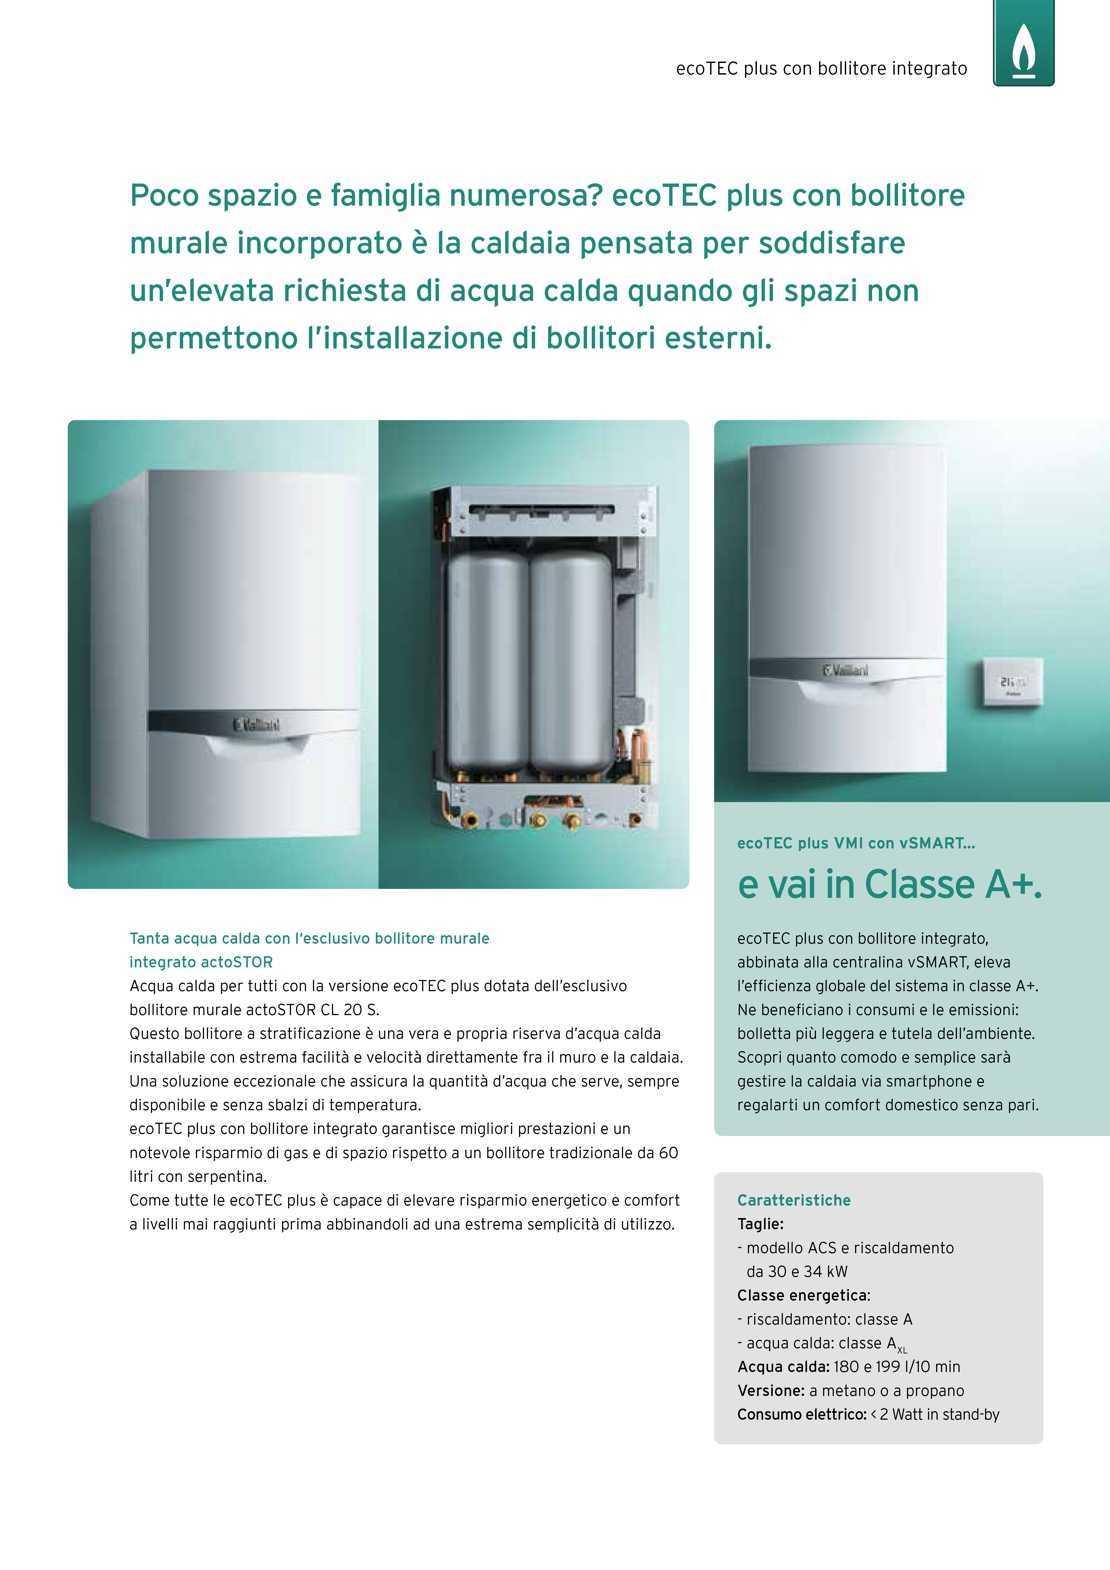 Vaillant Caldaia ecoTEC plus VMI306